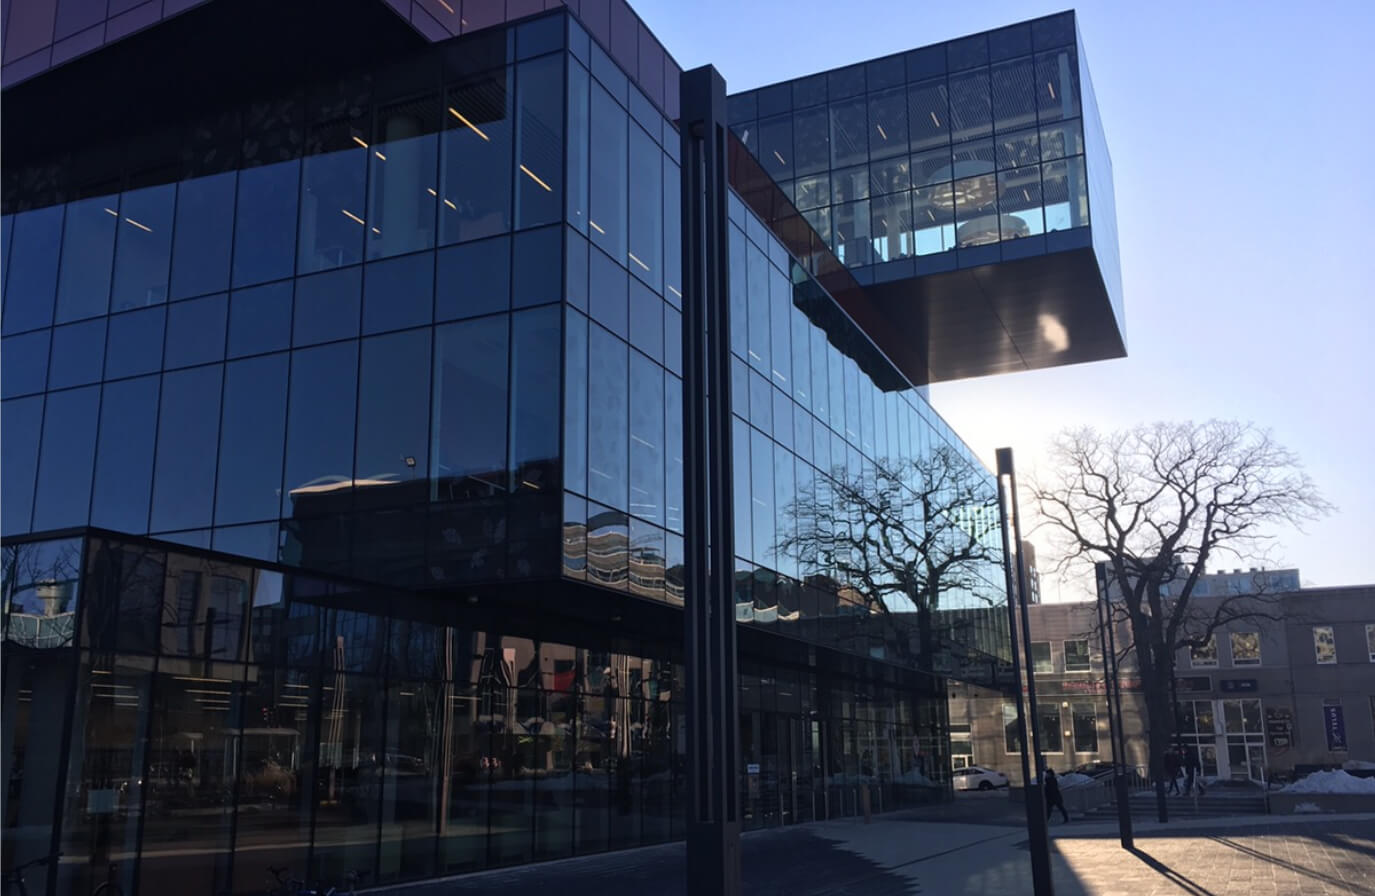 Halifax Central Library - ハリファックスで一番大きい図書館です。近代的な造りでかっこいい。